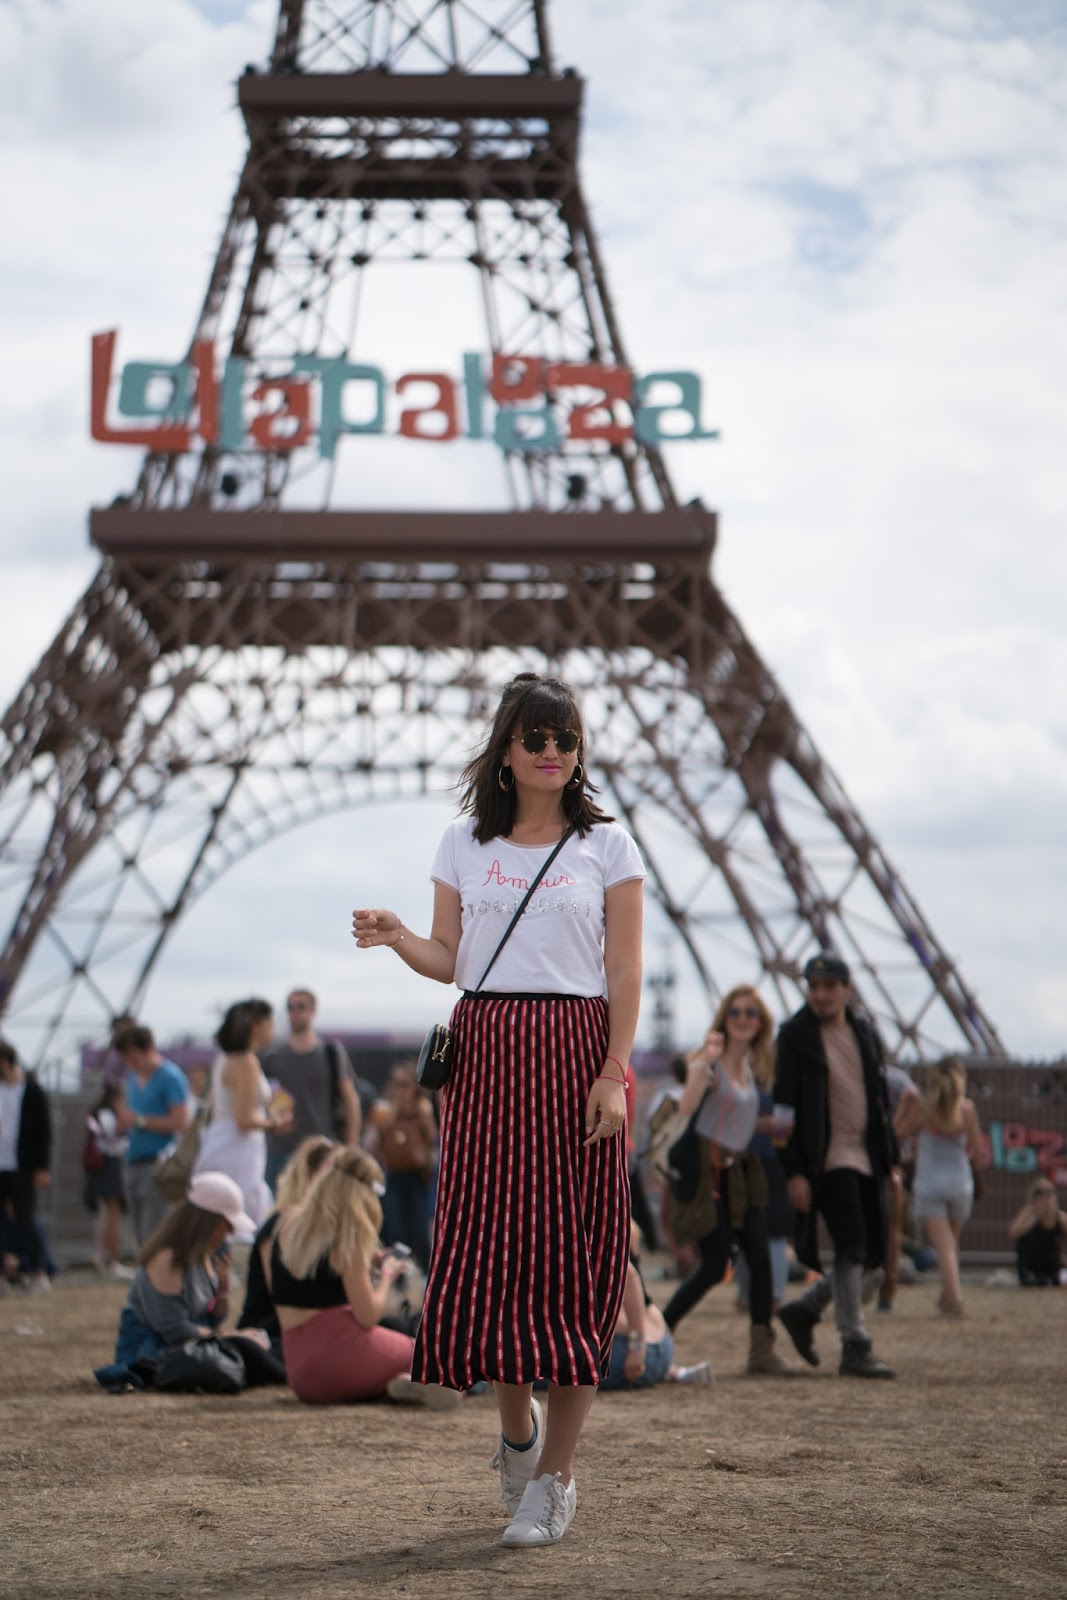 meetmeinparee-paris-lollapalooza-mode-fashion-pandora